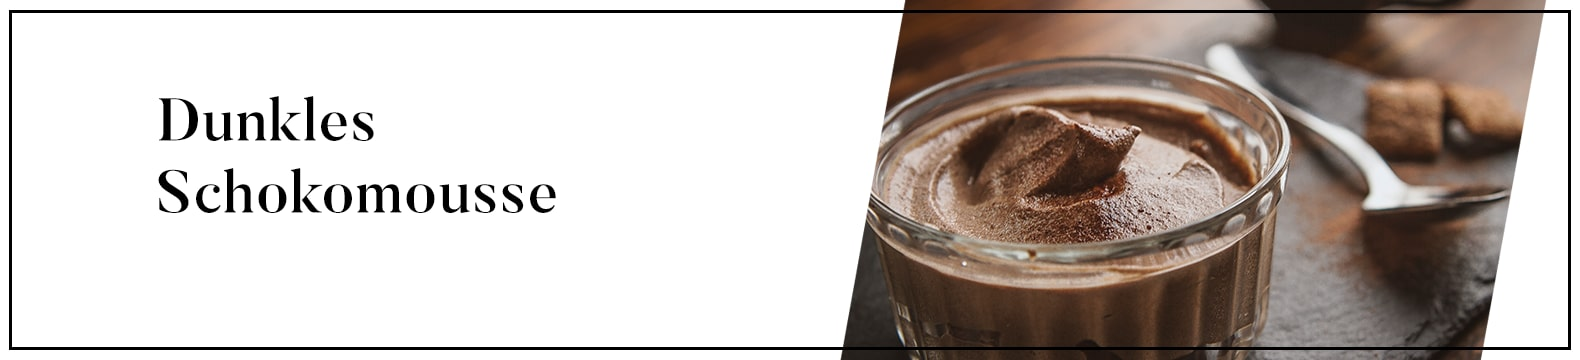 Dunkles Schokomousse mit salziger Schokoladensauce